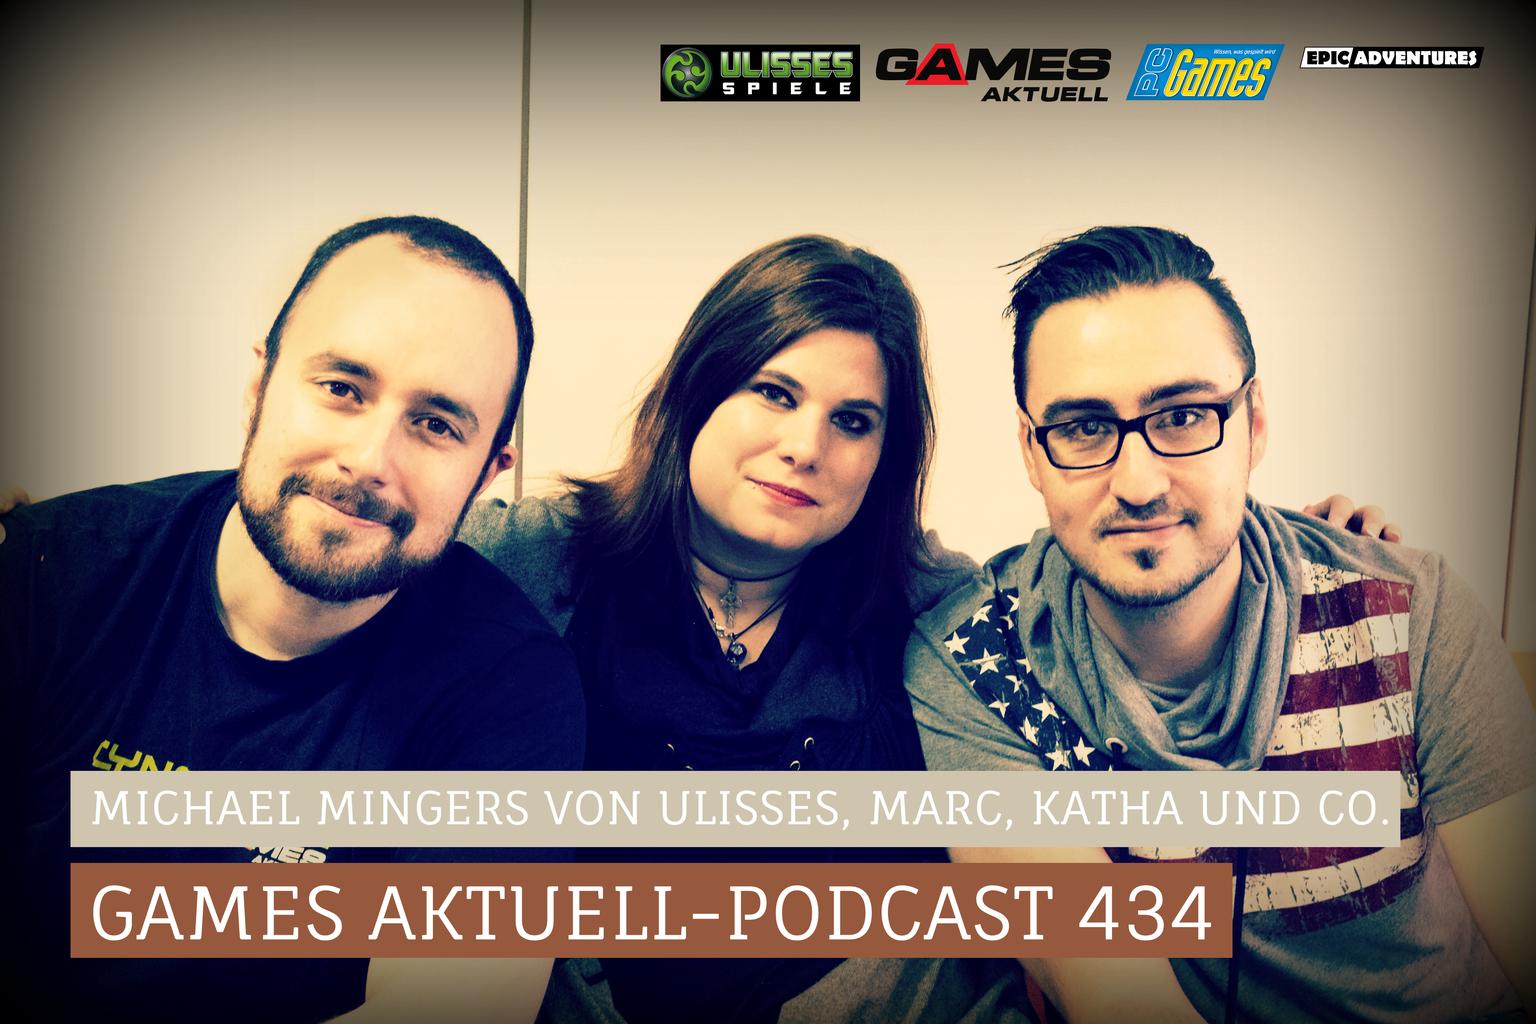 Games Aktuell Michael Mingers, Marc Hatke, Computec, Ulisses Spiele